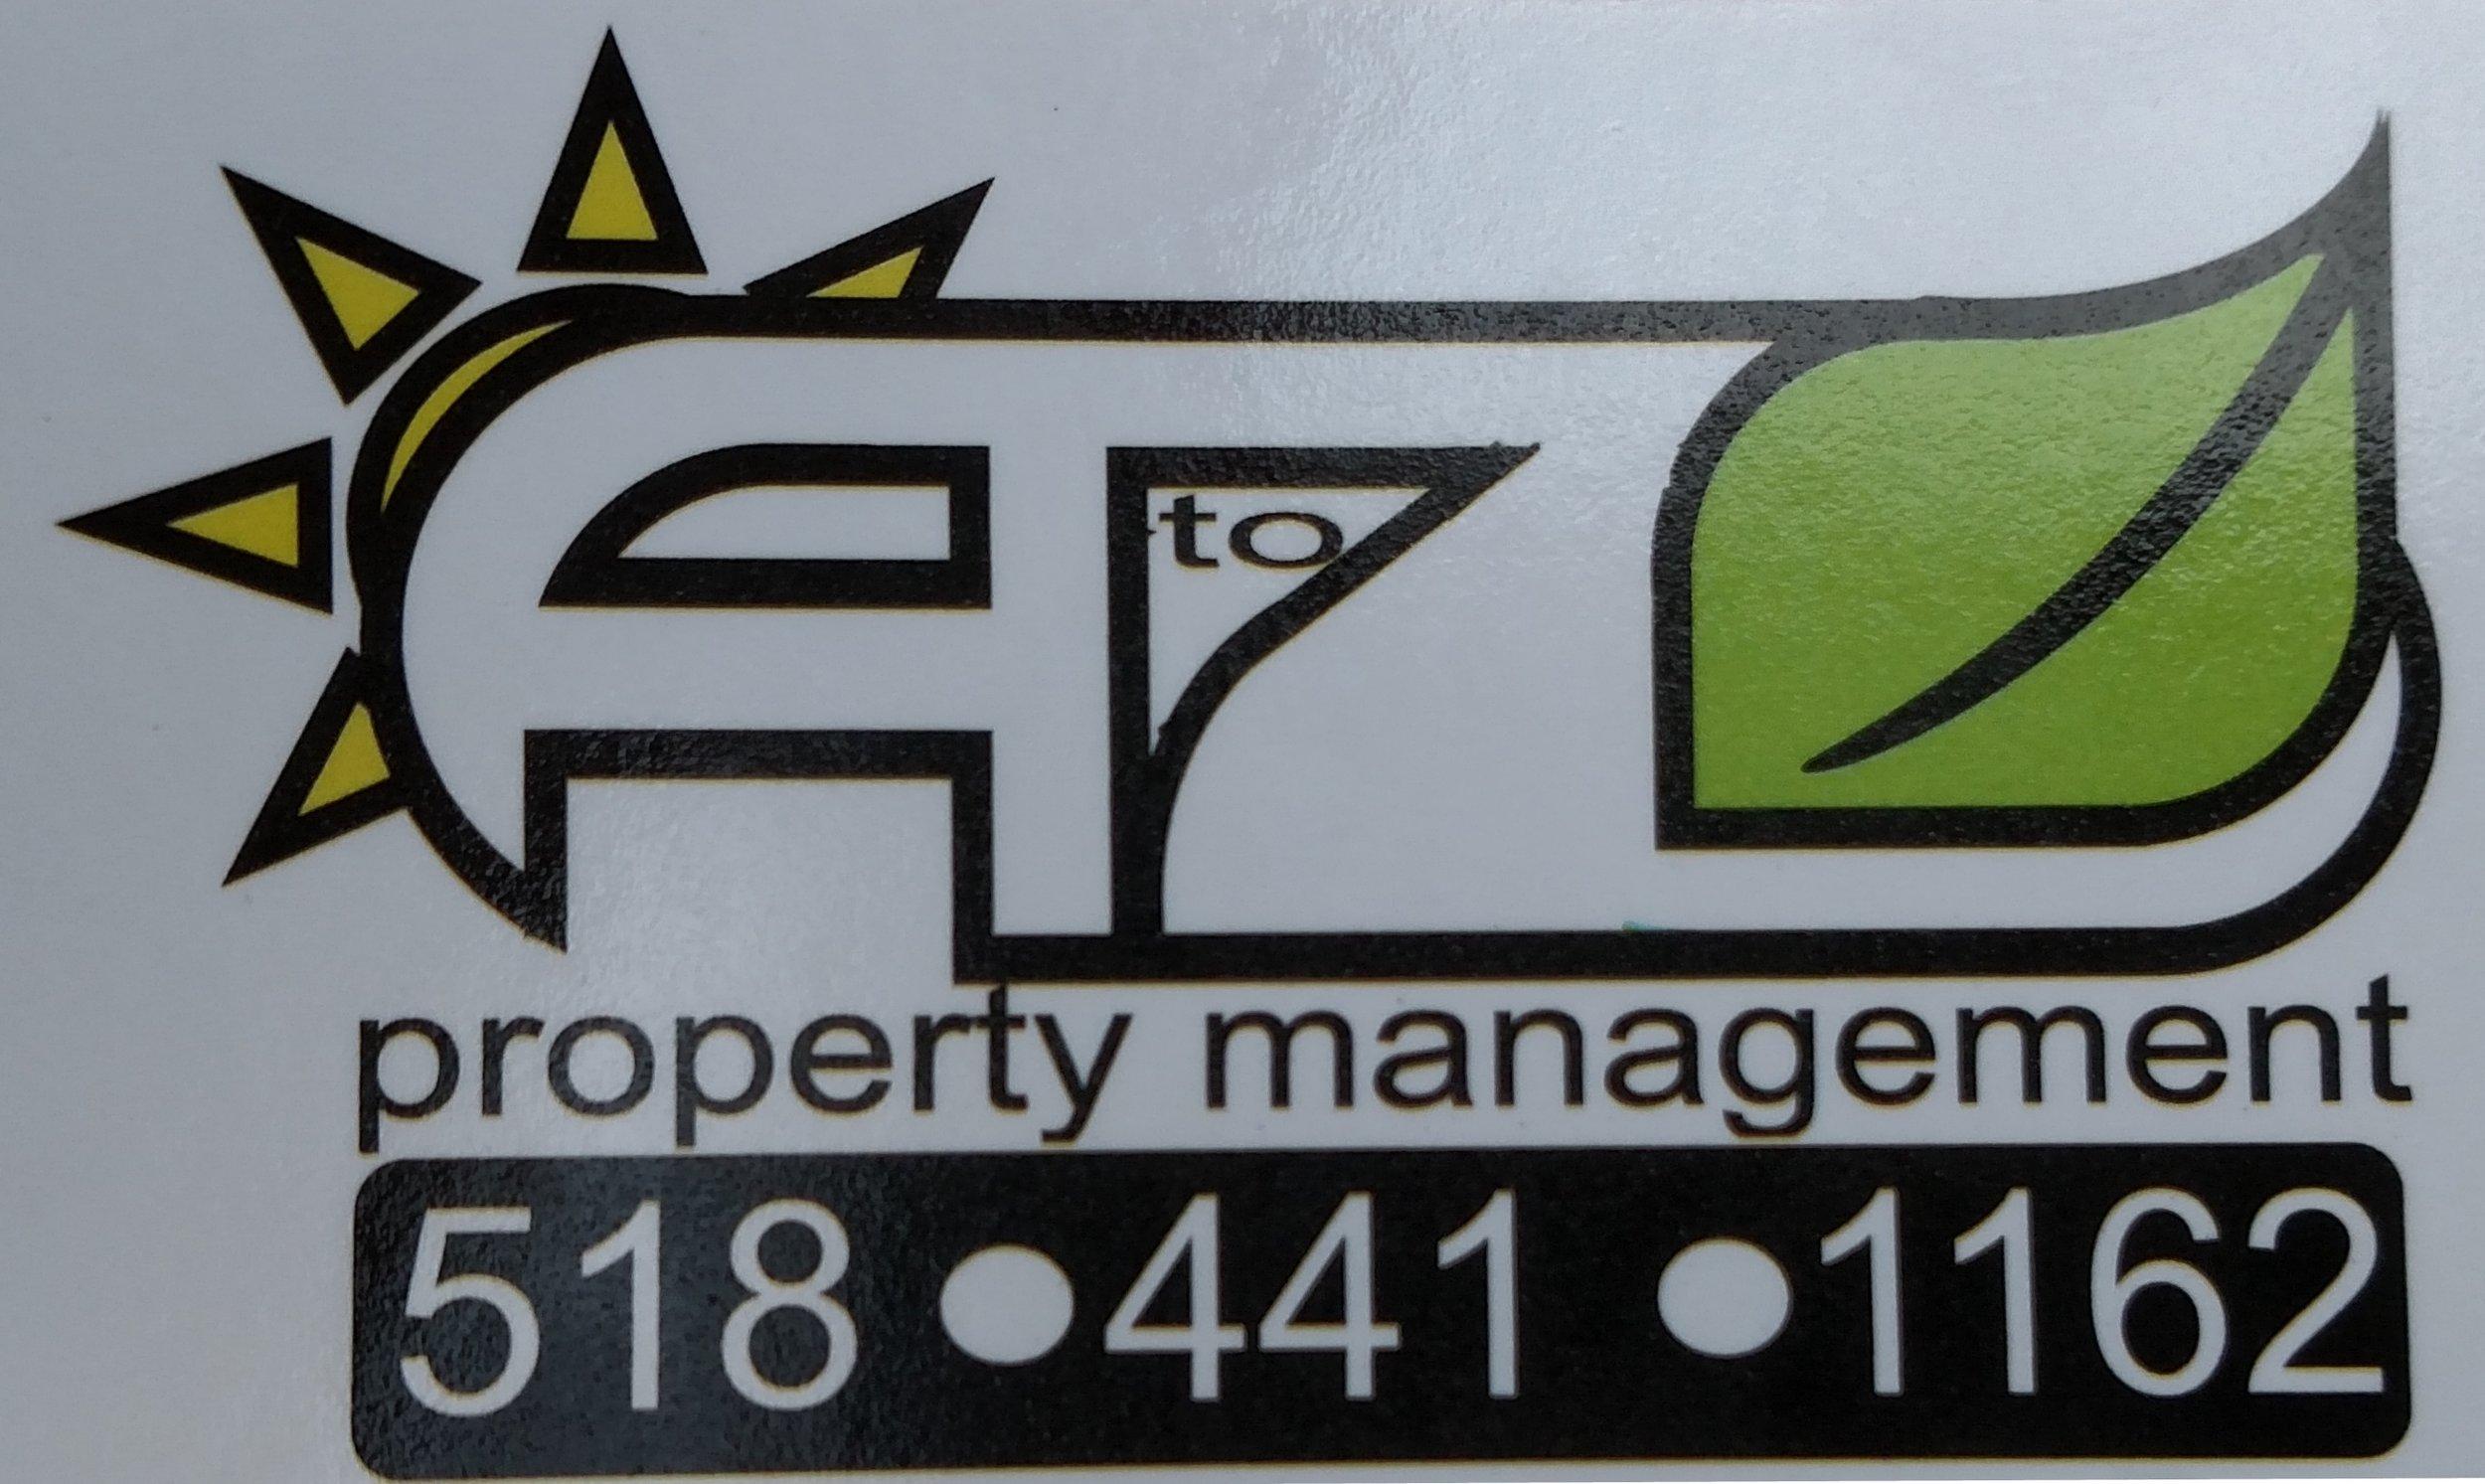 AtoZ Lawn Care.jpg